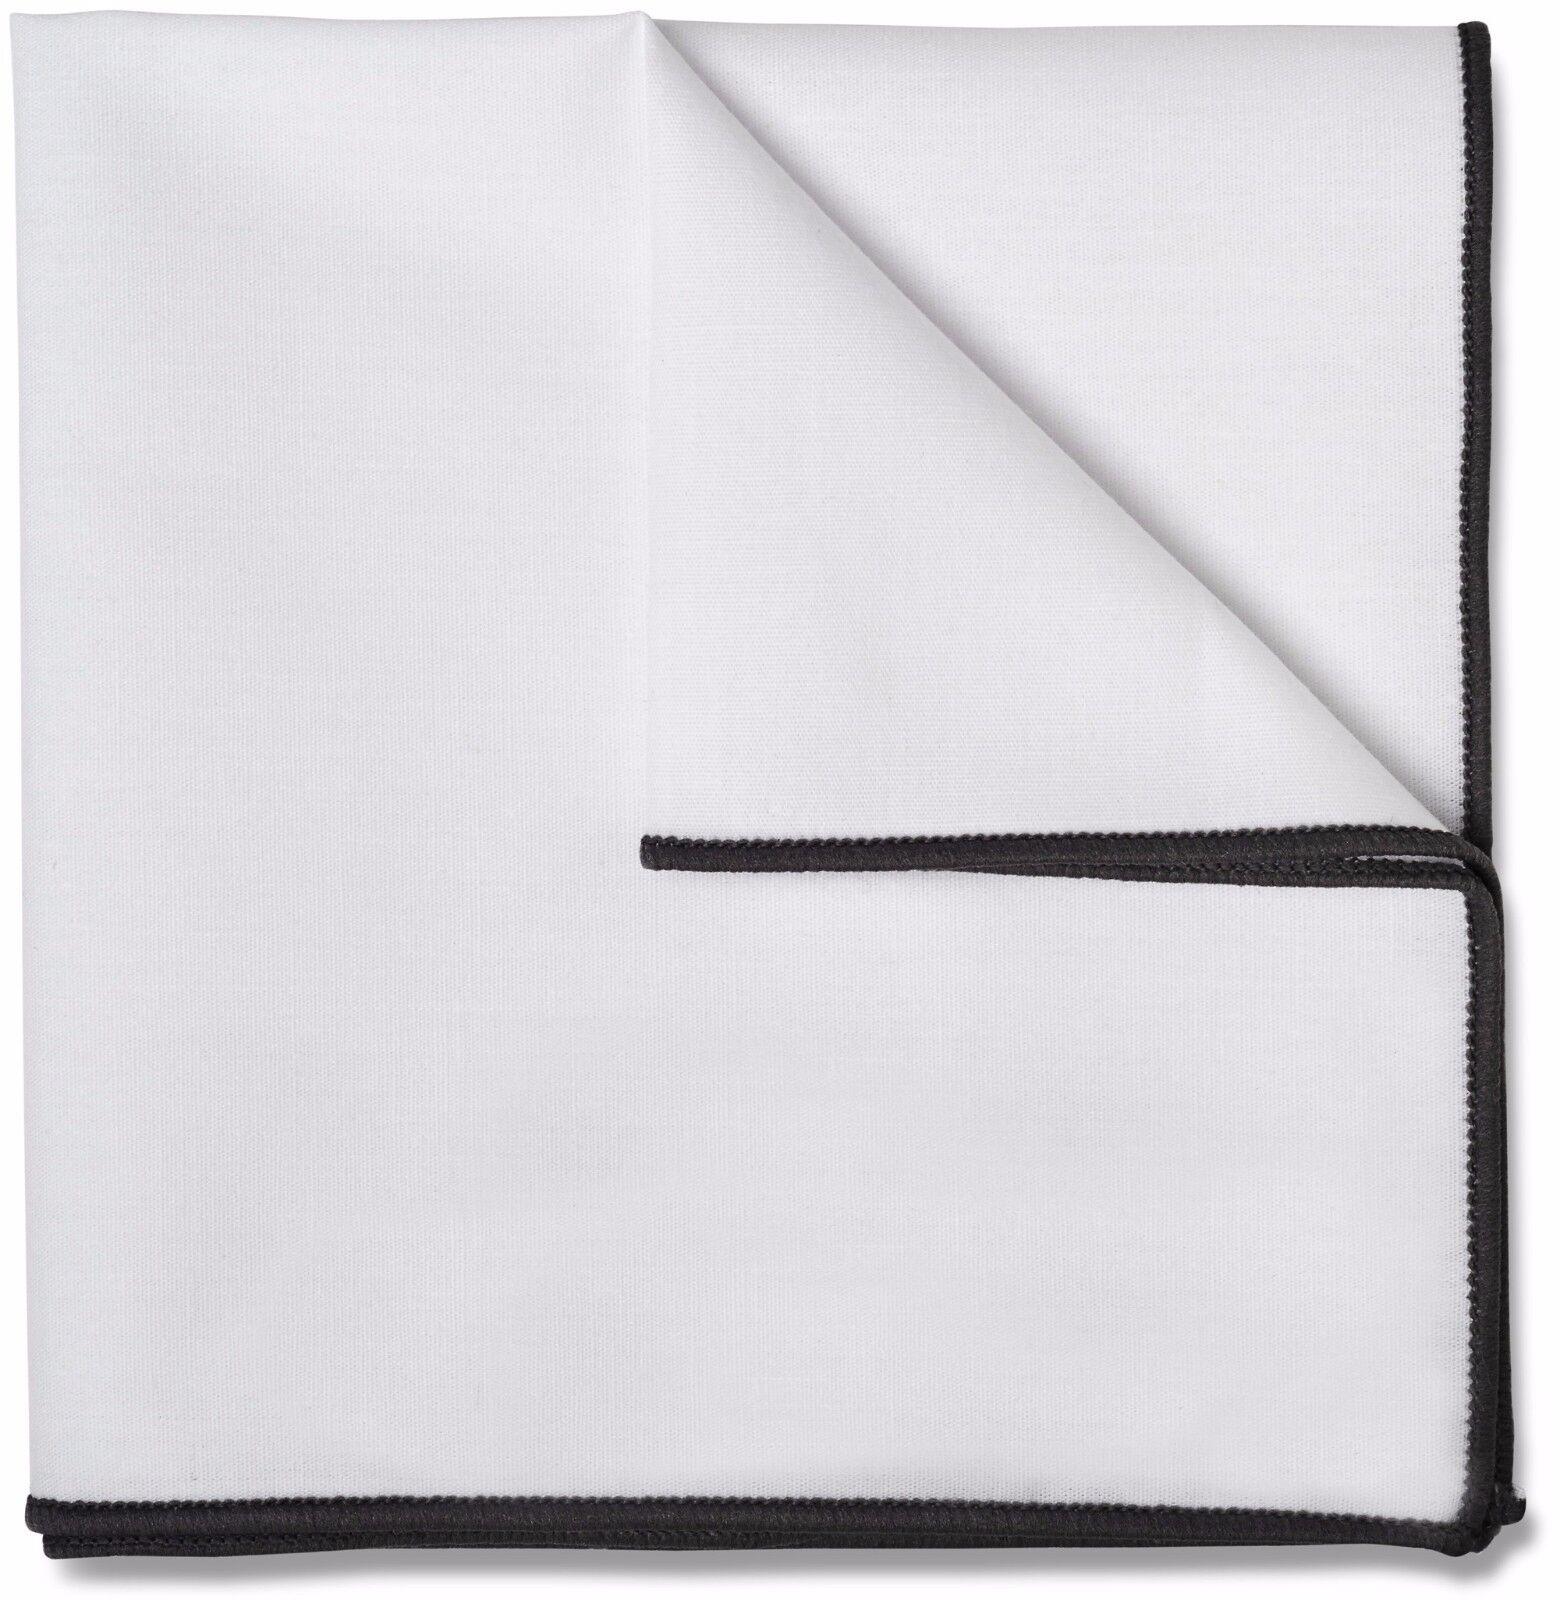 Mens White Pocket Square 100% Cotton 10 x 10 Grey Border PC-PSQ-GRY